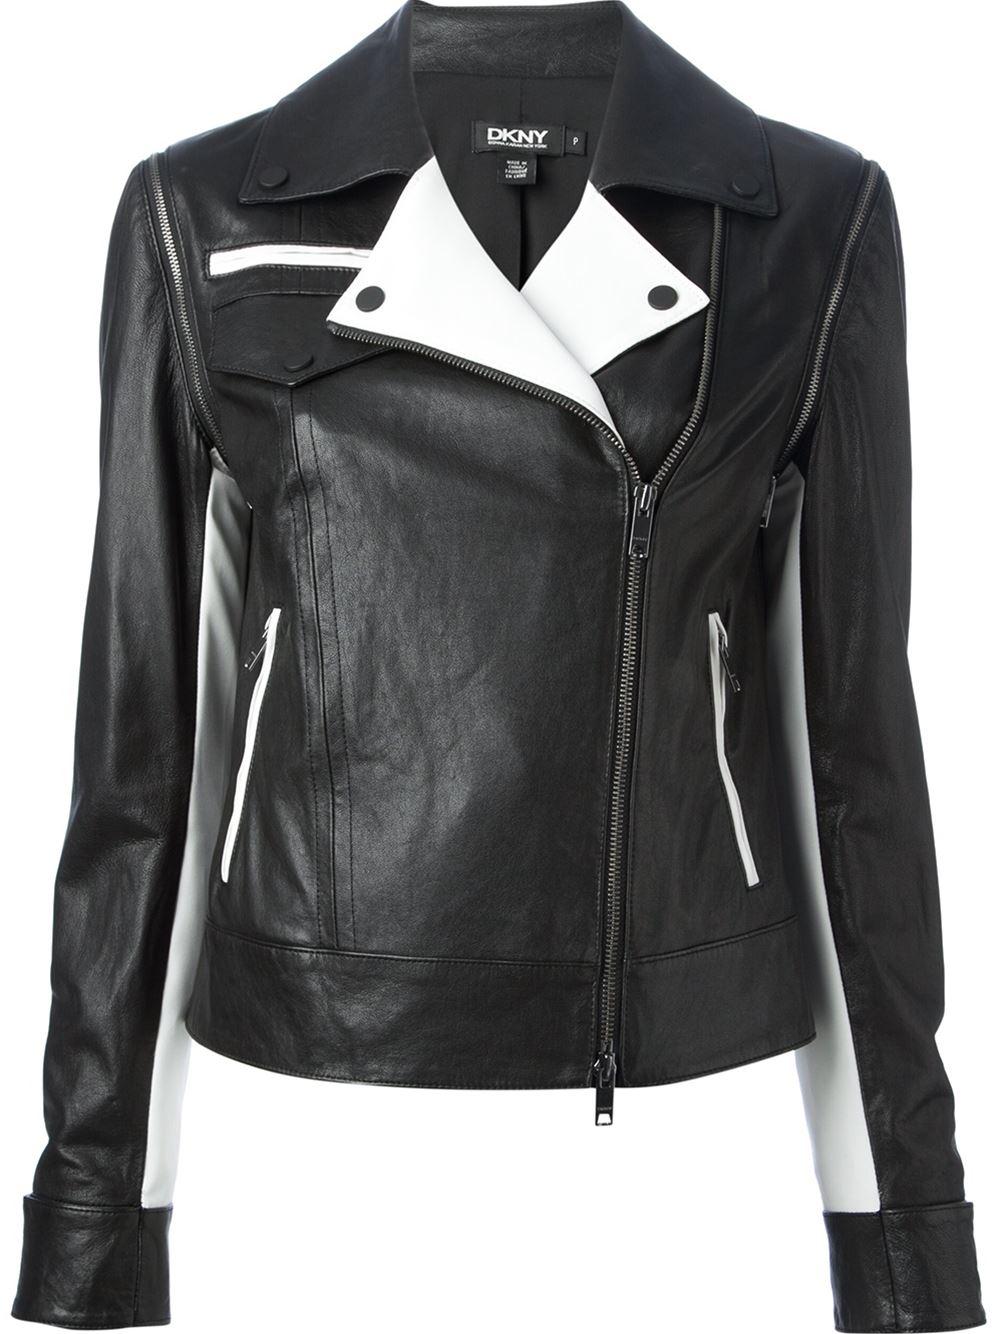 My leather jacket